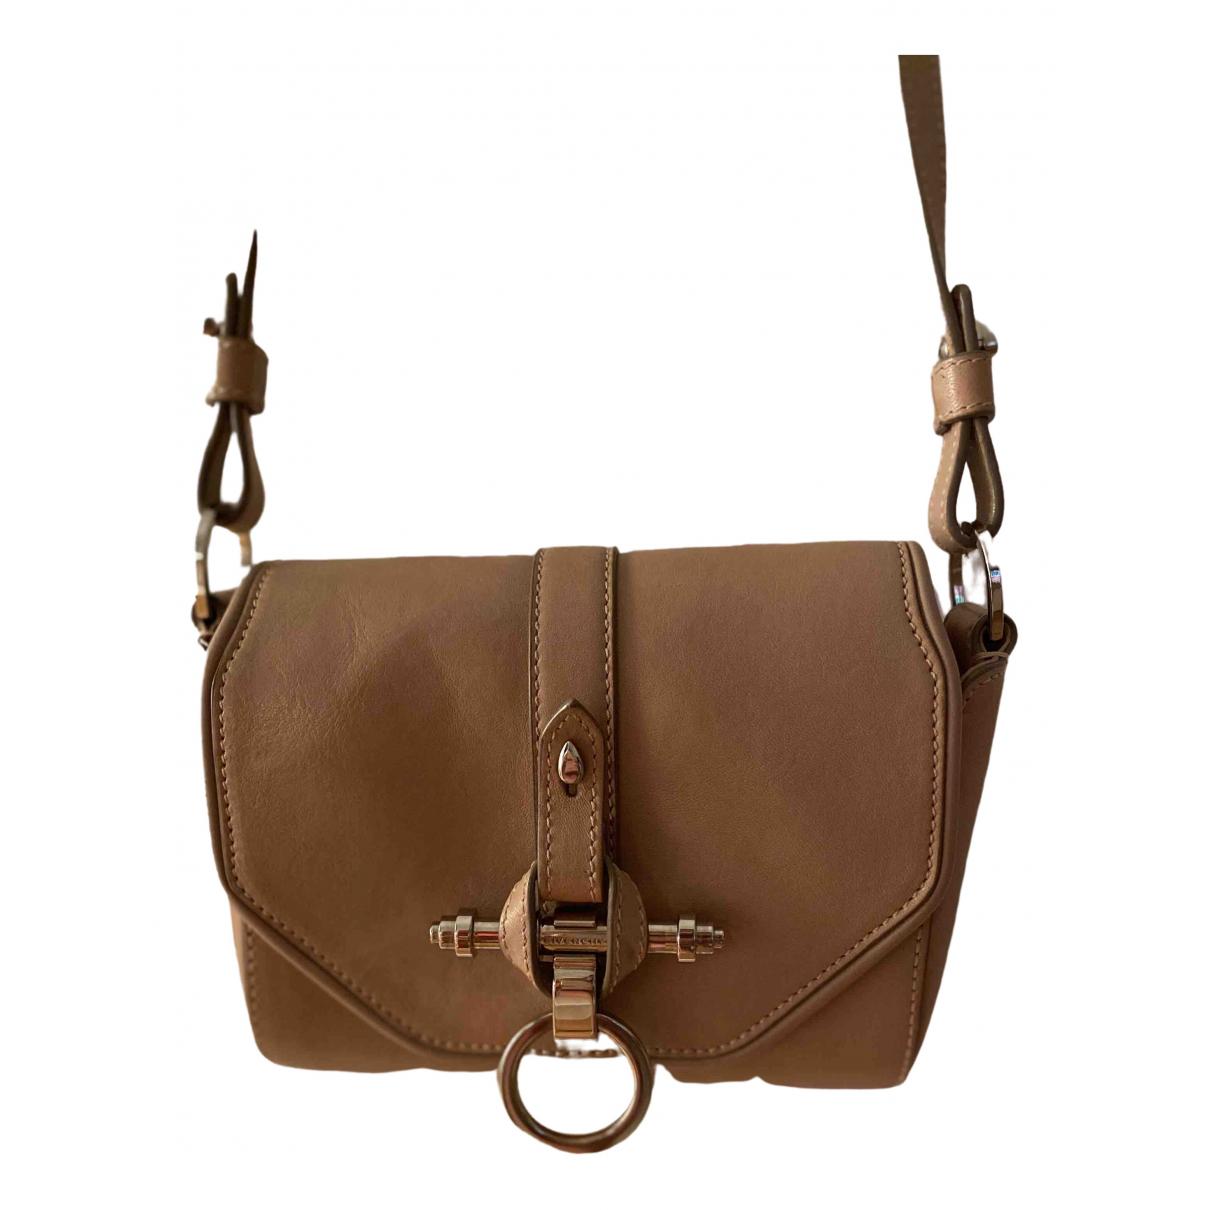 Givenchy - Sac a main Obsedia pour femme en cuir - beige